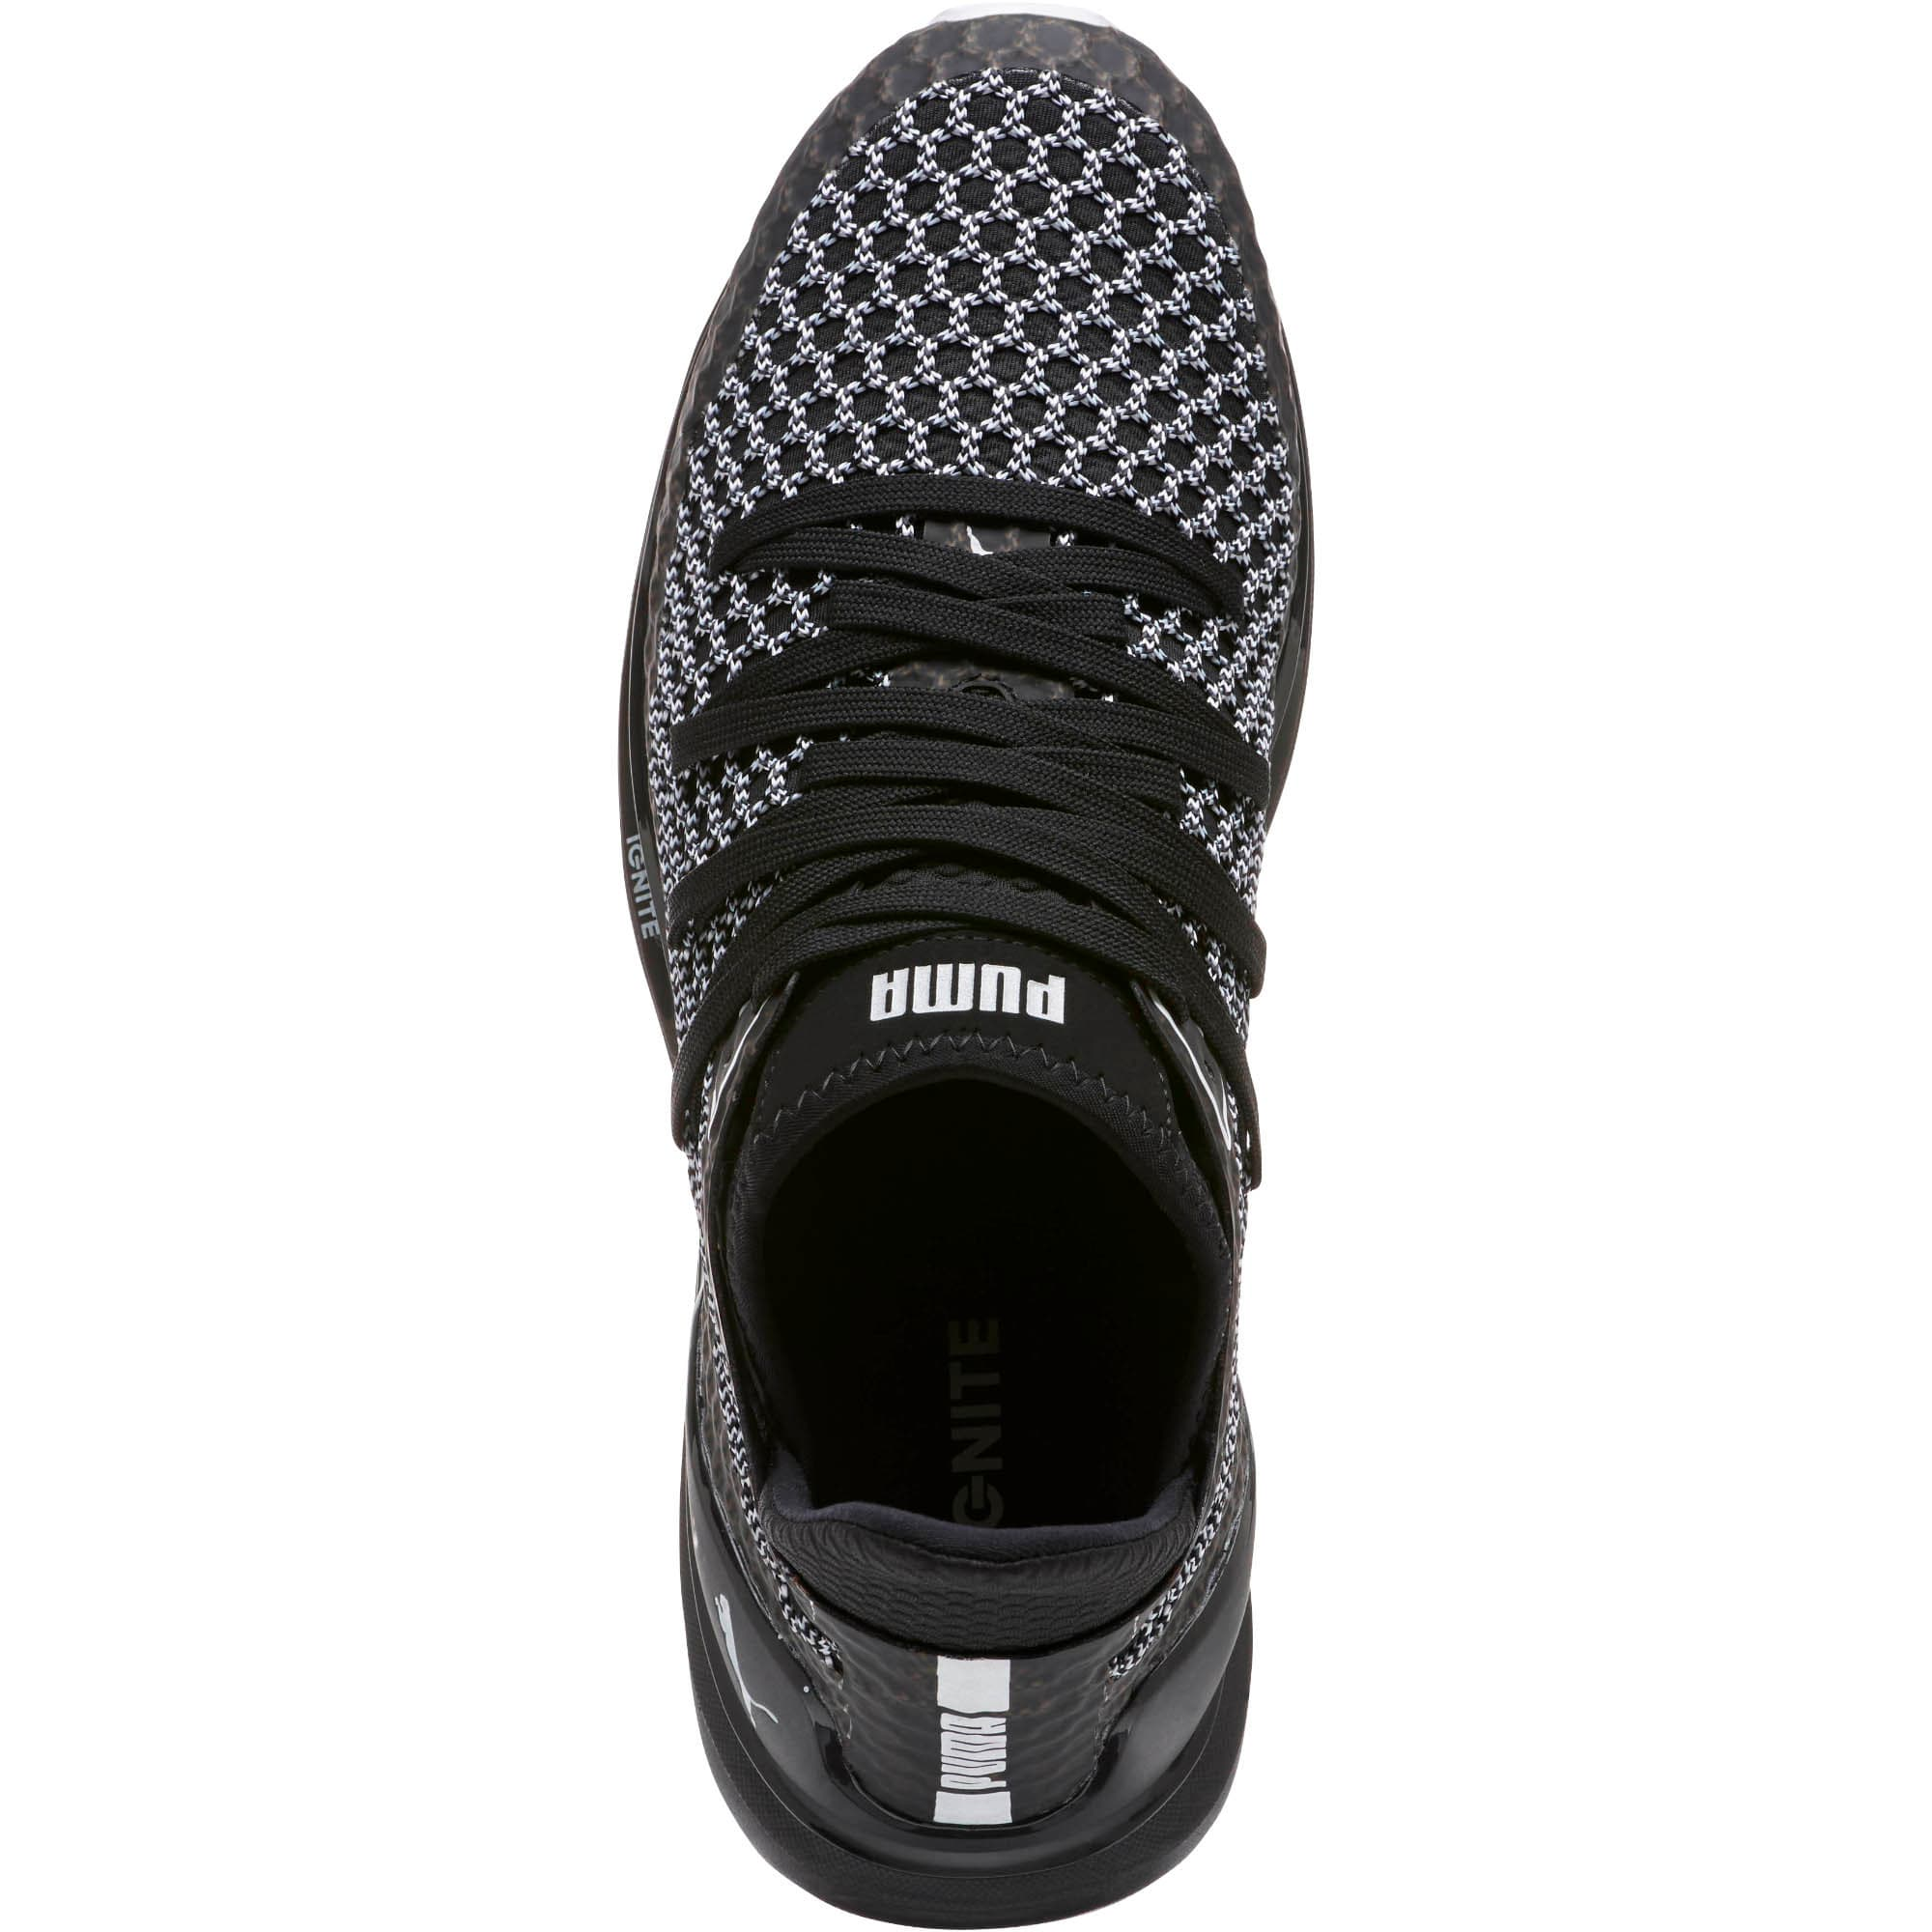 Thumbnail 5 of IGNITE Limitless NETFIT Multi Sneakers, Puma Black-Puma White, medium